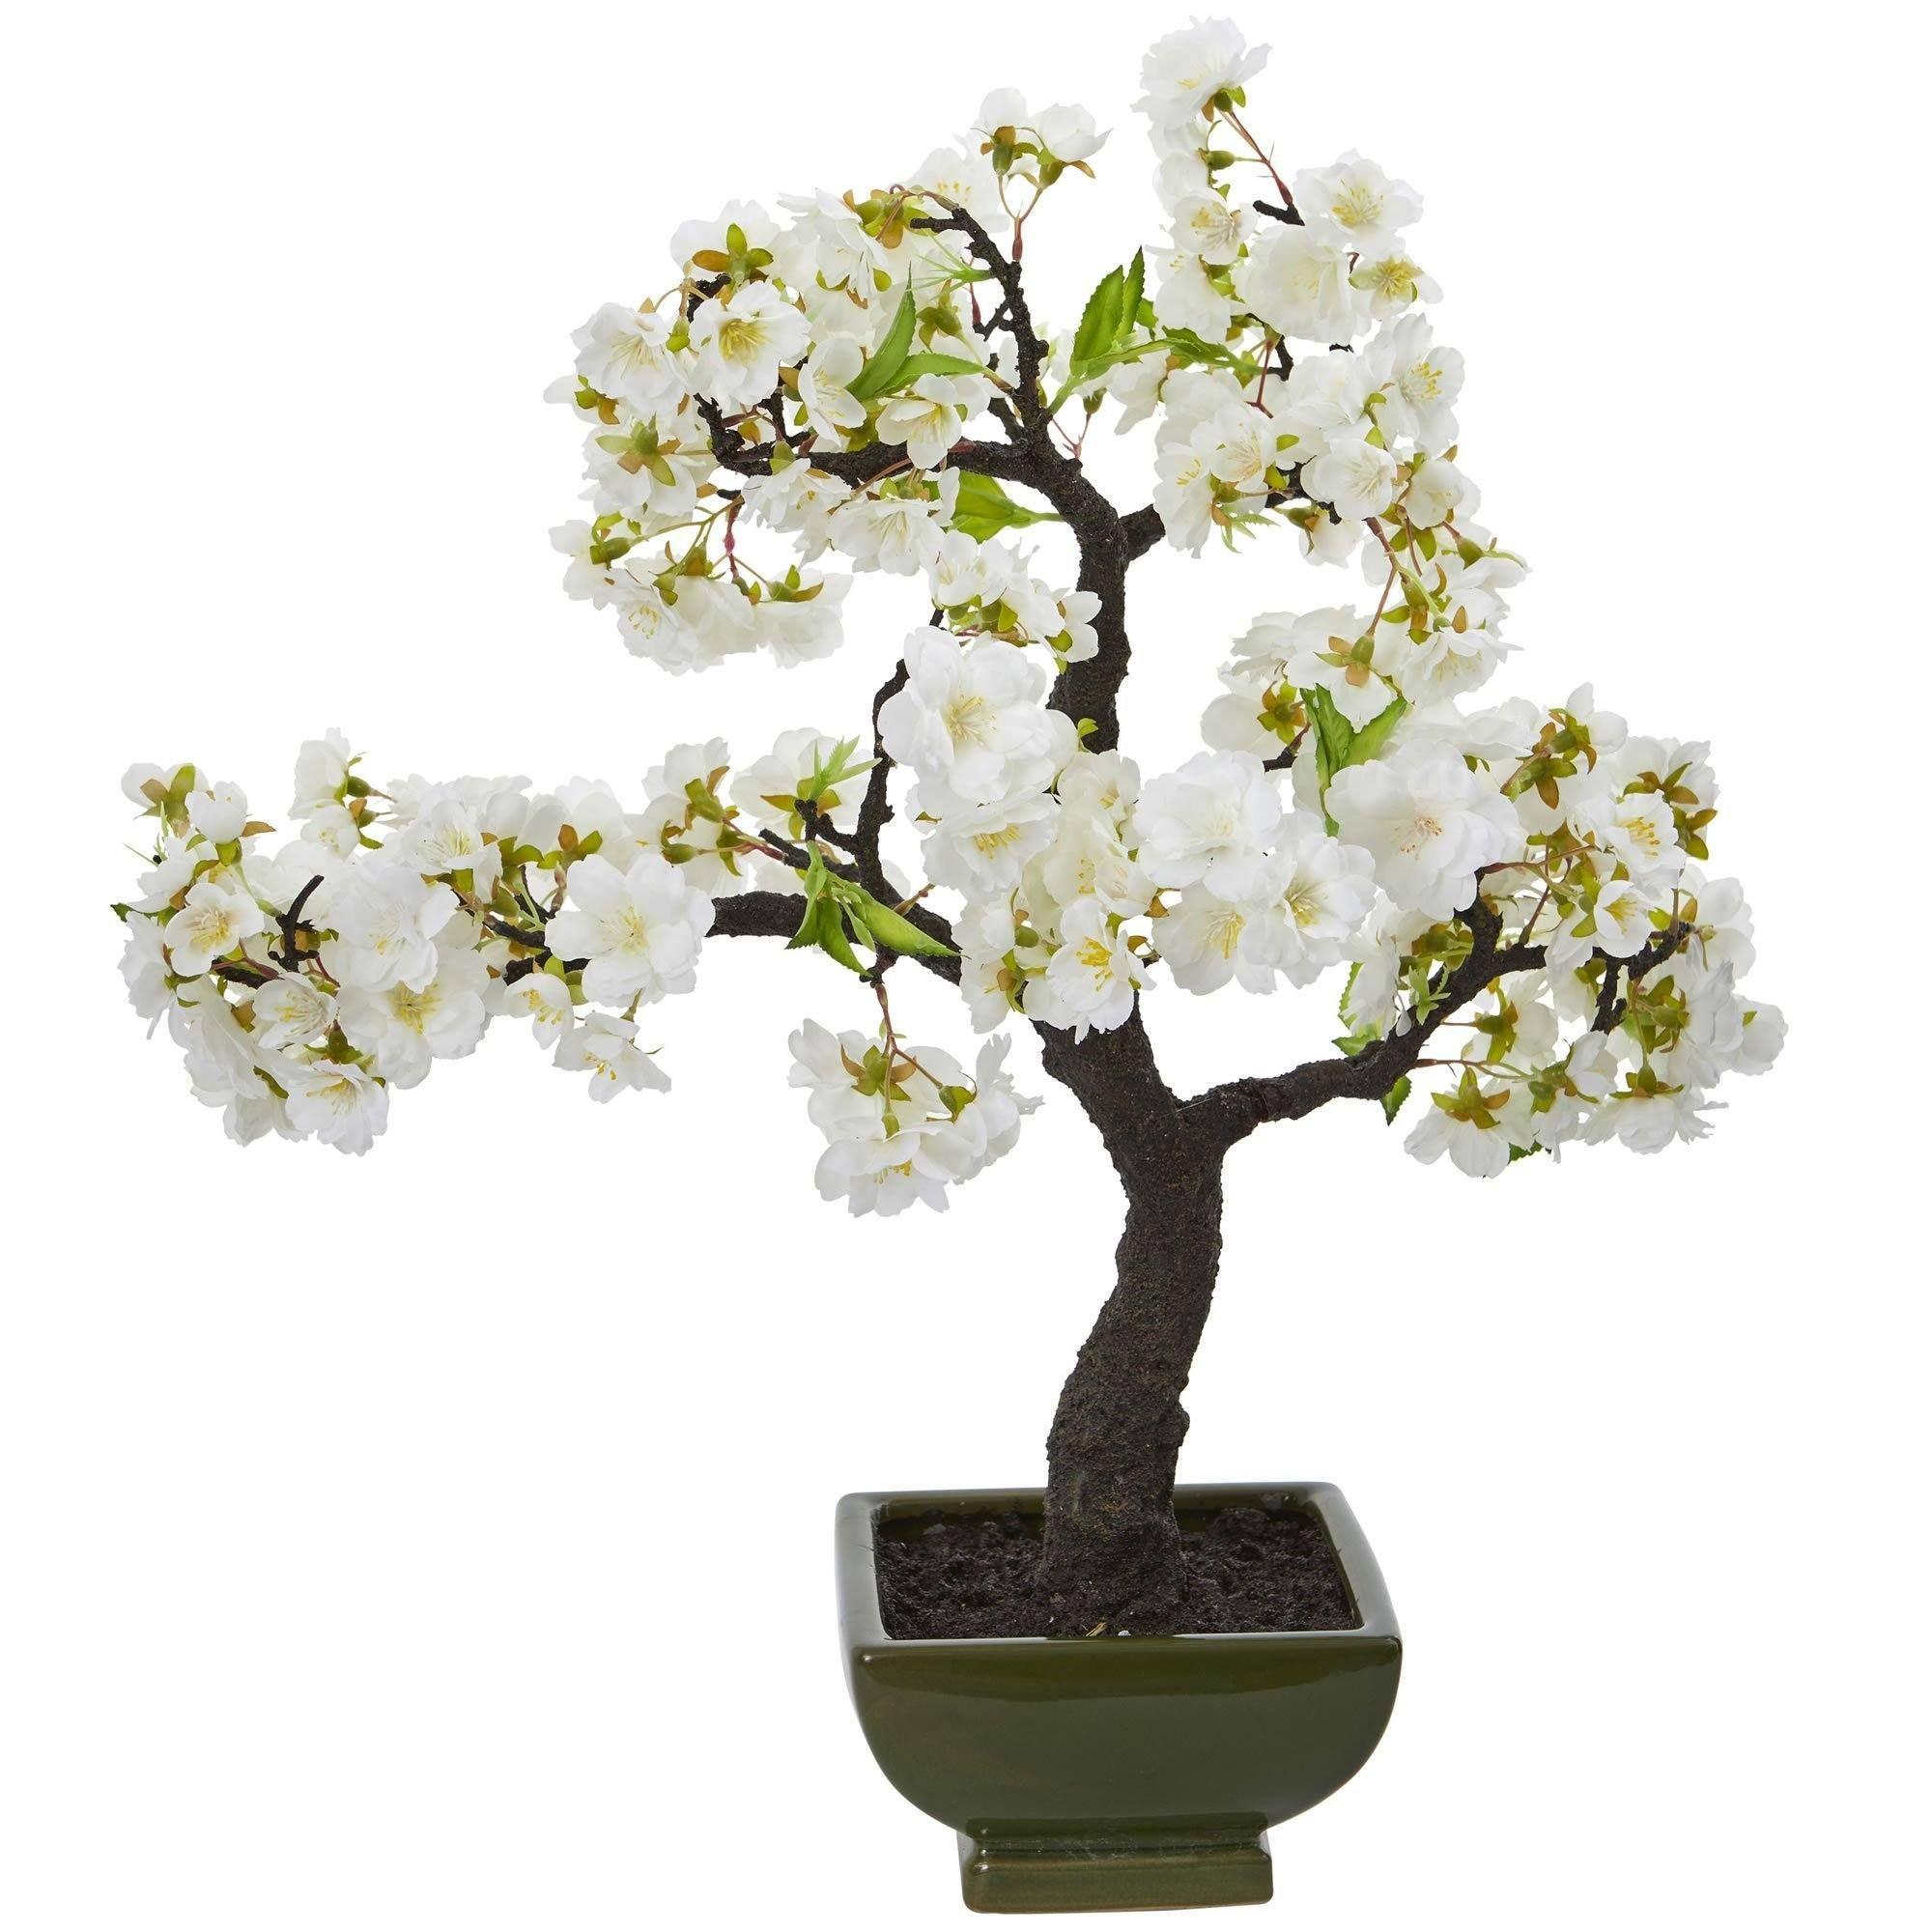 Cherry Blossom Bonsai Artificial Tree Cherry Blossom Bonsai Tree Artificial Cherry Blossom Tree Flowering Bonsai Tree